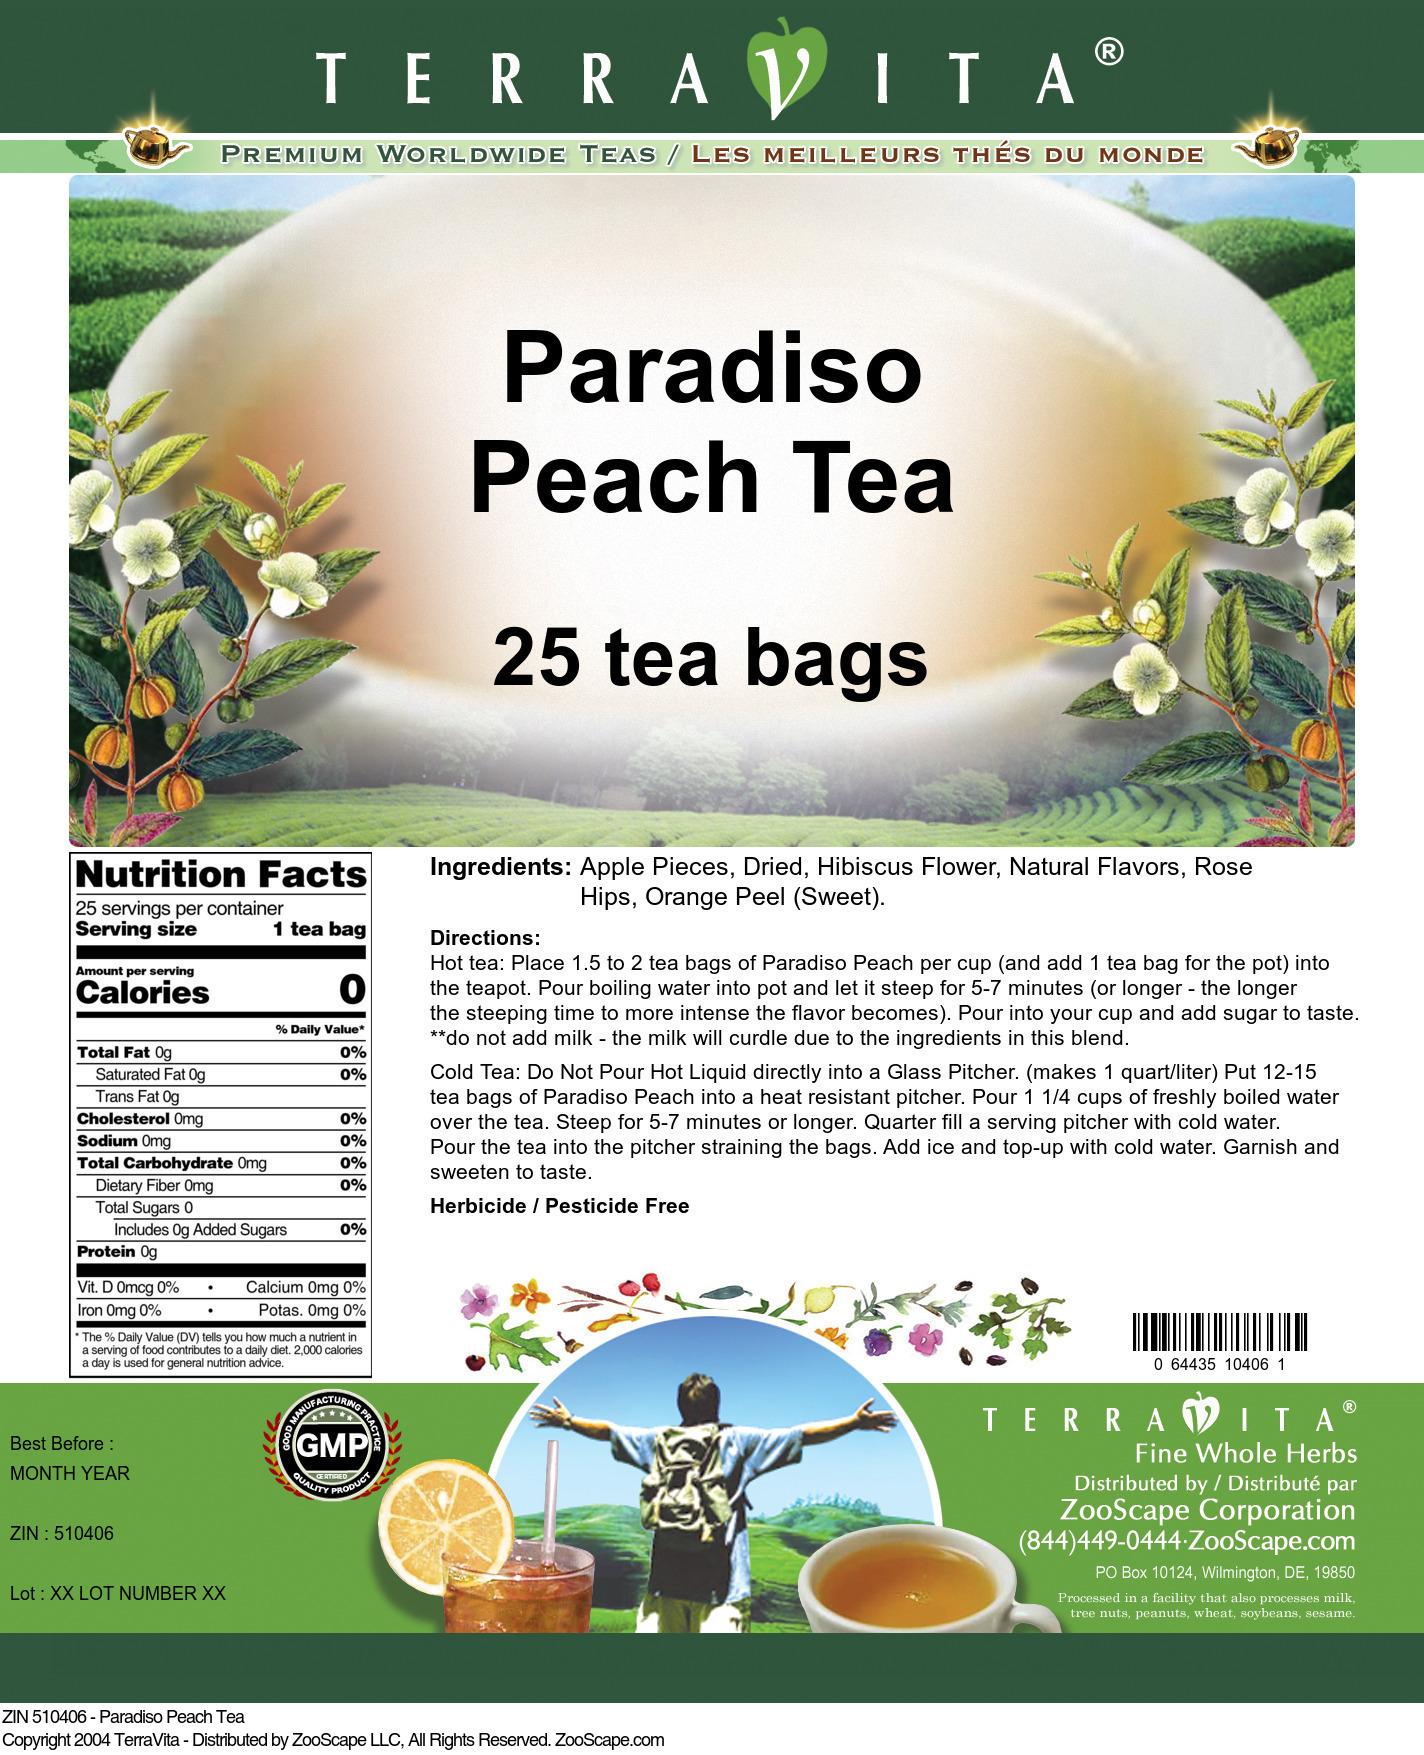 Paradiso Peach